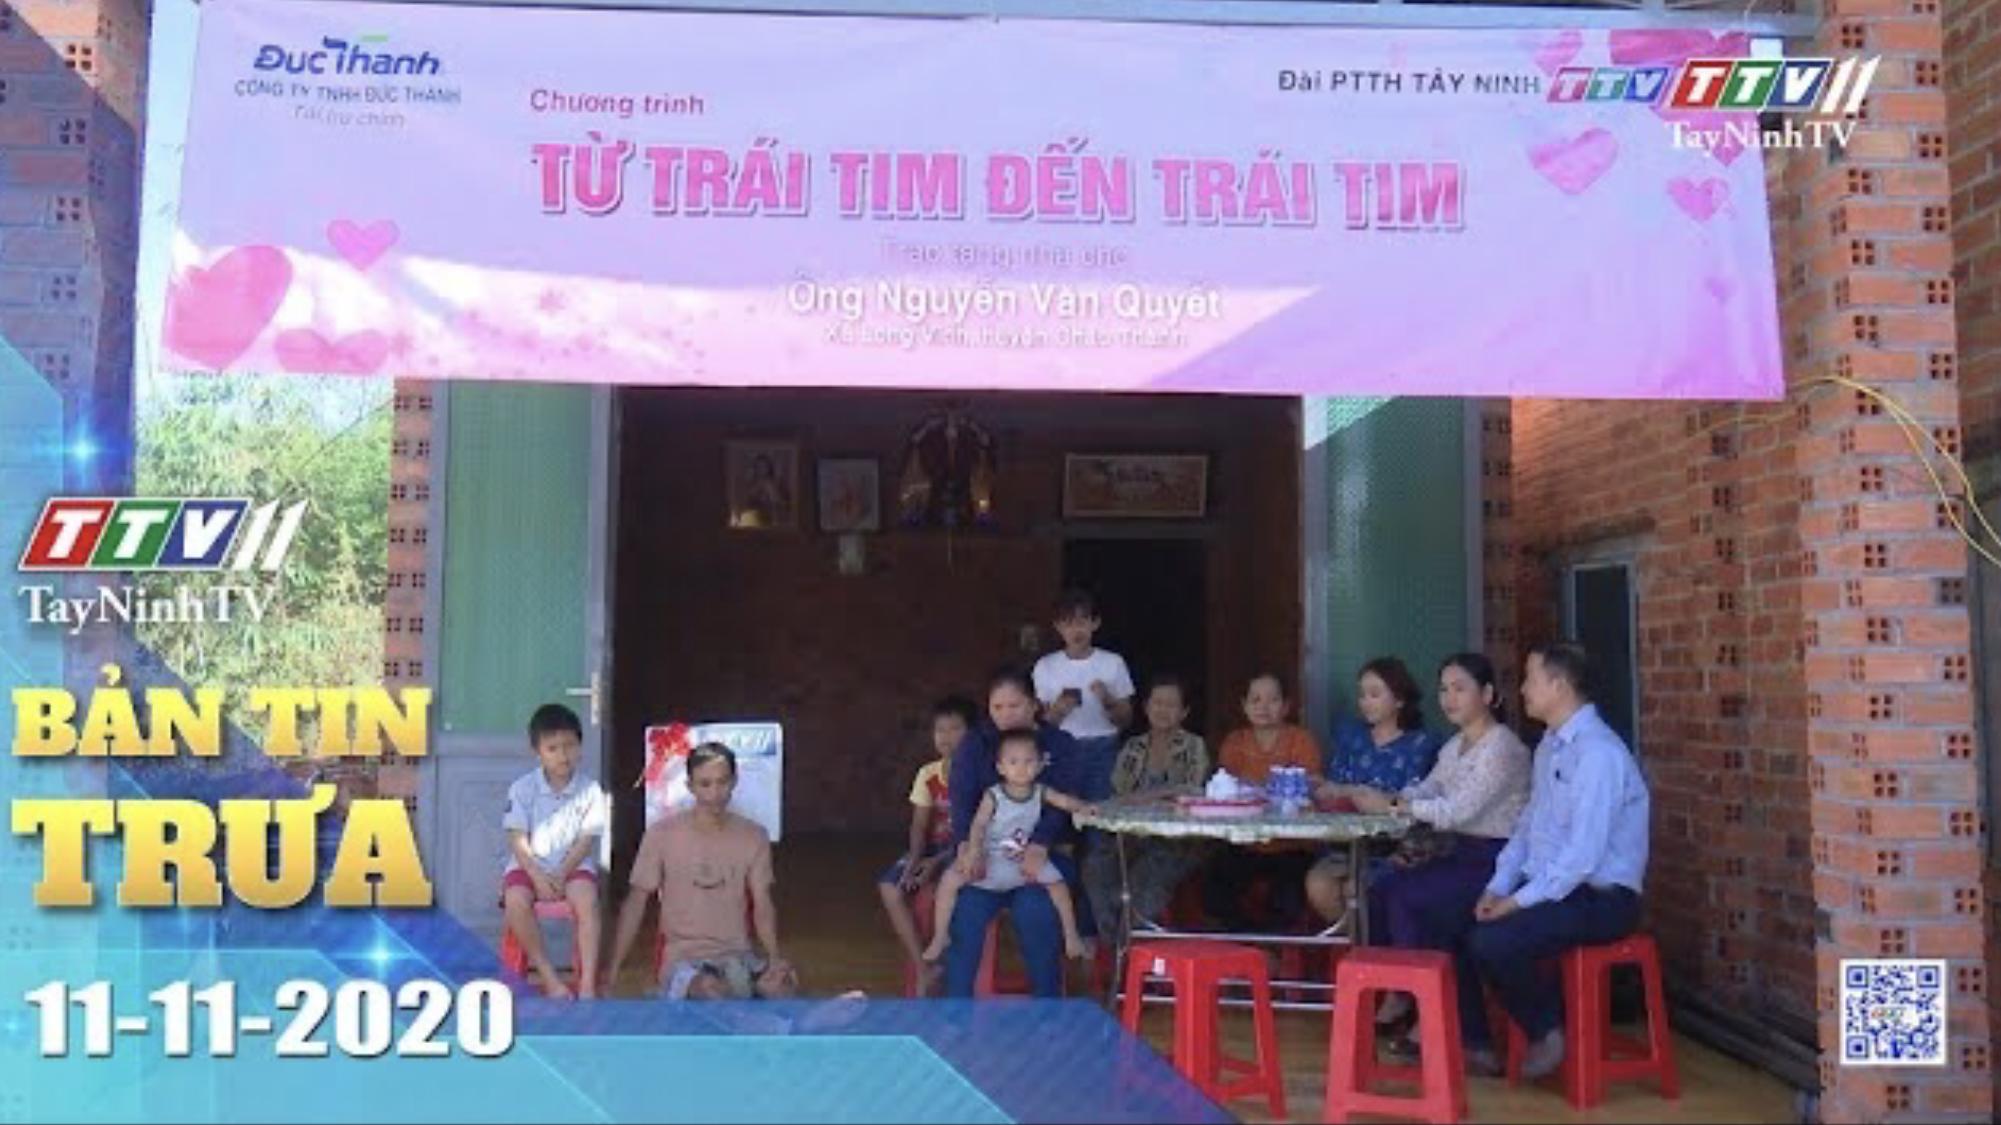 Bản tin trưa 11-11-2020 | Tin tức hôm nay | TayNinhTV